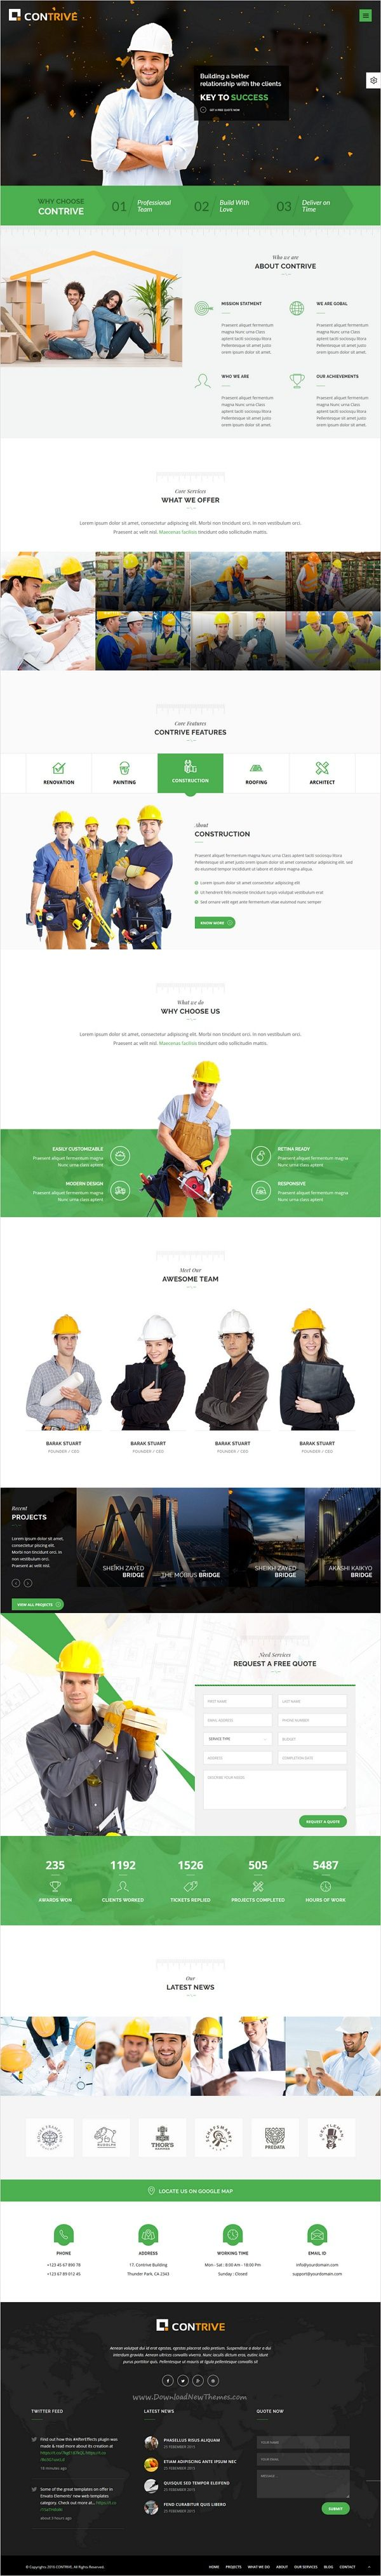 Contrive Building Construction Html5 Template Joomla Themes Wordpress Theme Responsive Web Layout Design